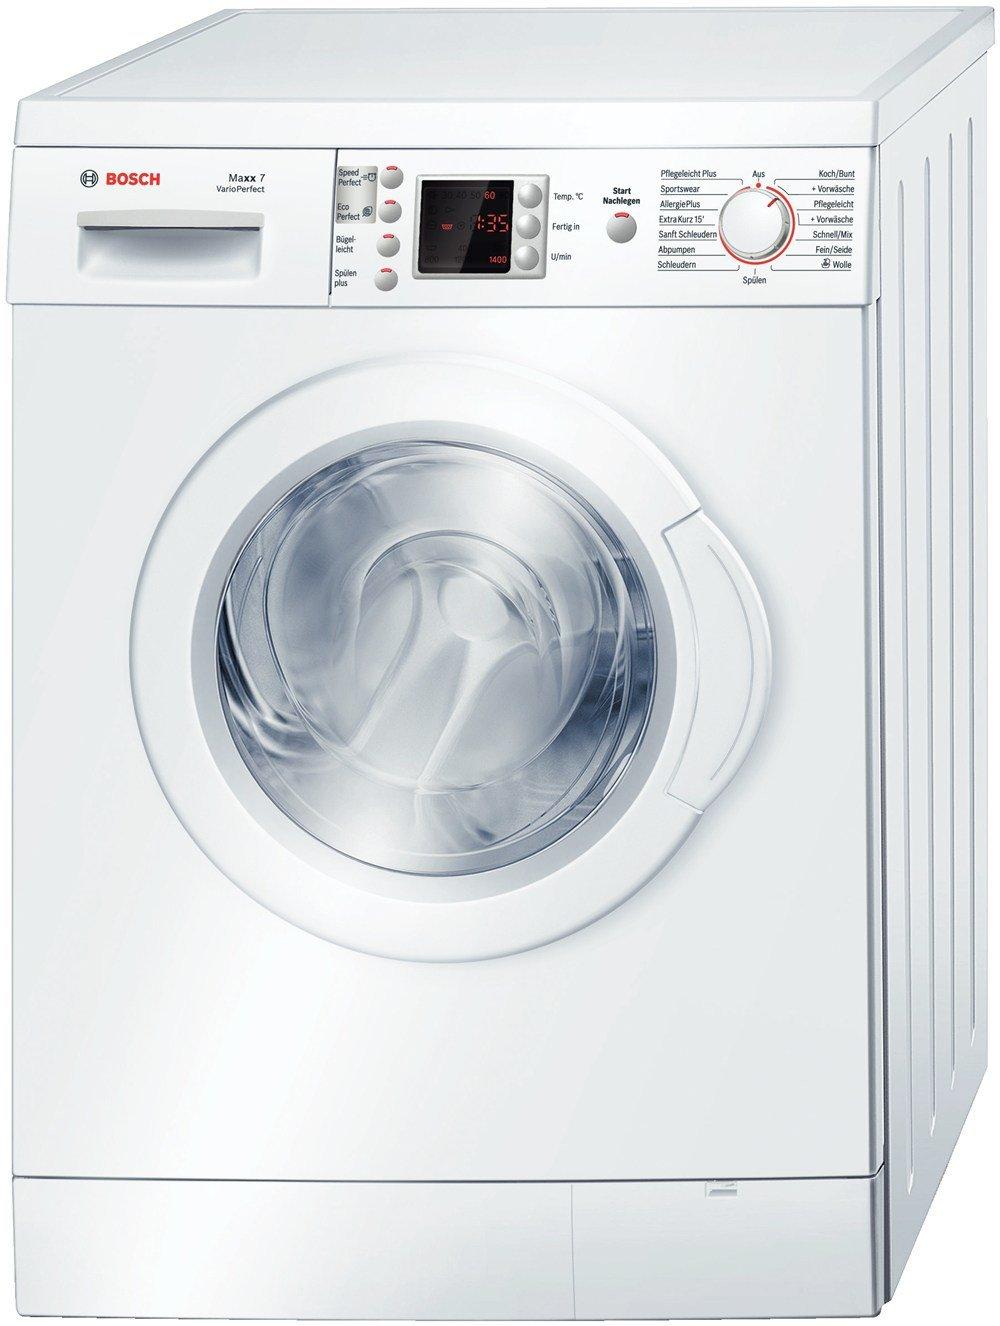 Bosch WAE28424 - Lavadora (A + +, 0.95 kWh, 48 L, LED, 600 mm, 590 ...